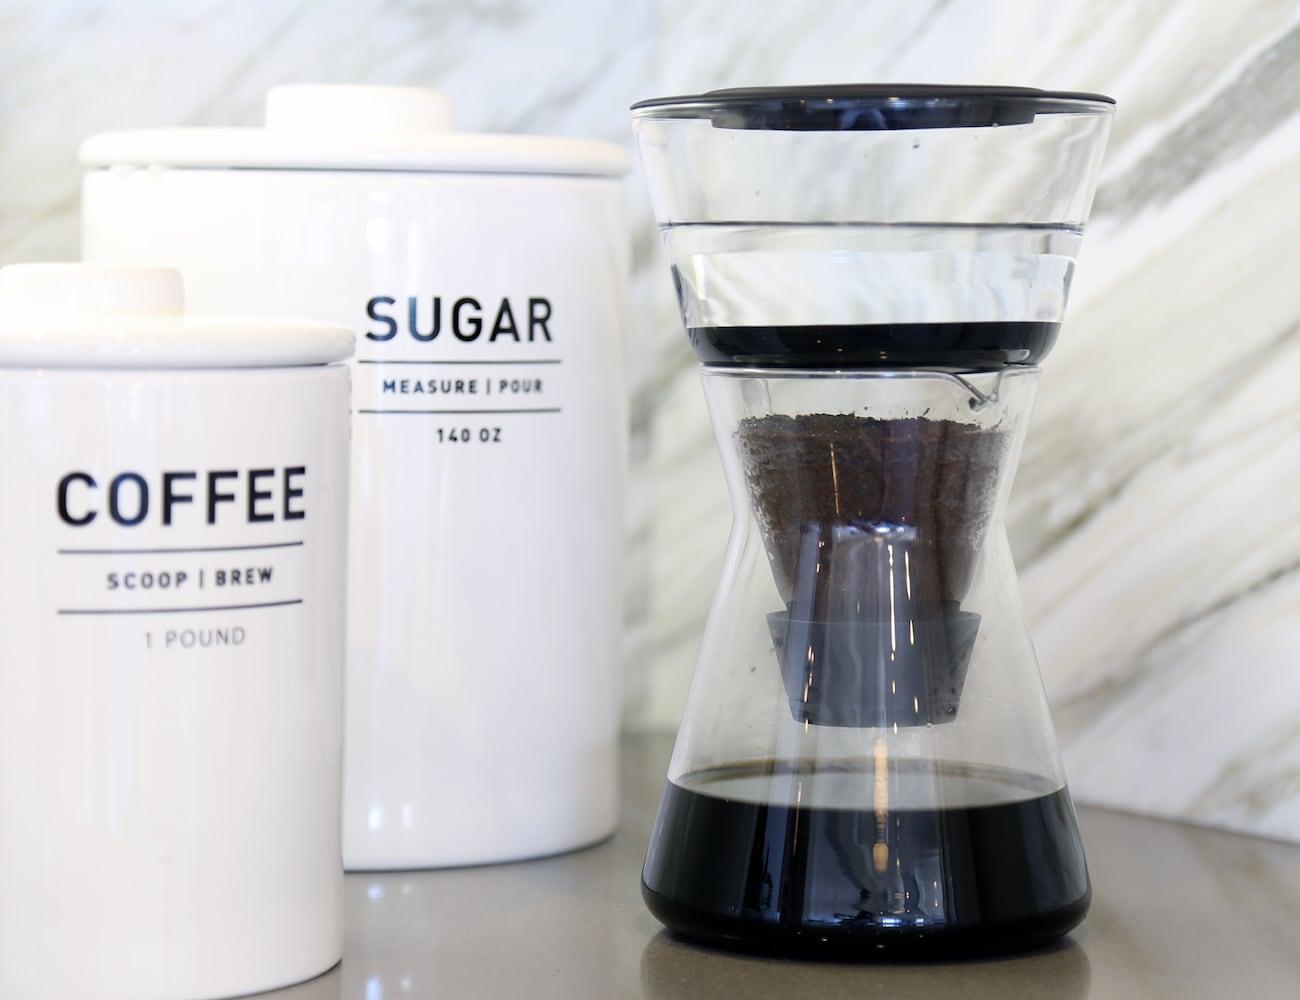 Gravity 4-in-1 Craft Coffee Maker